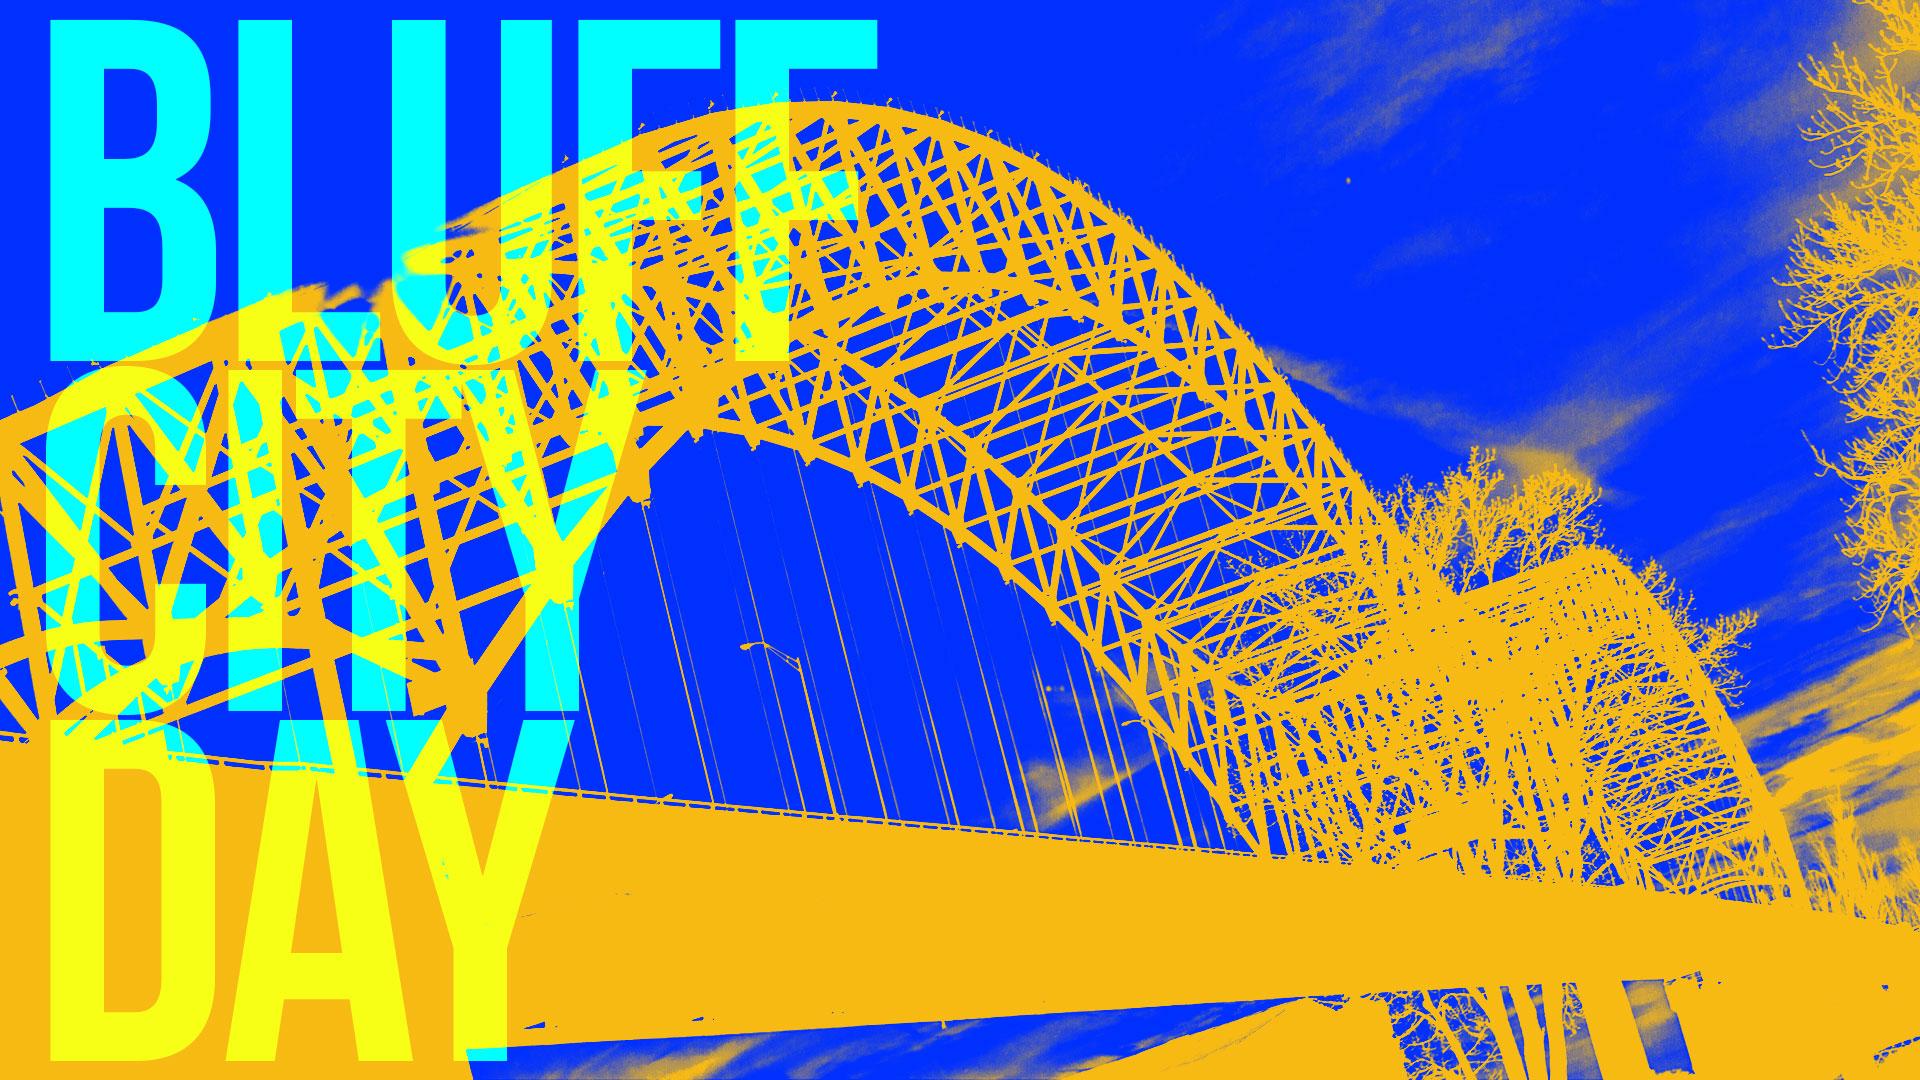 071819_Bluff-City-Day_WEB.jpg